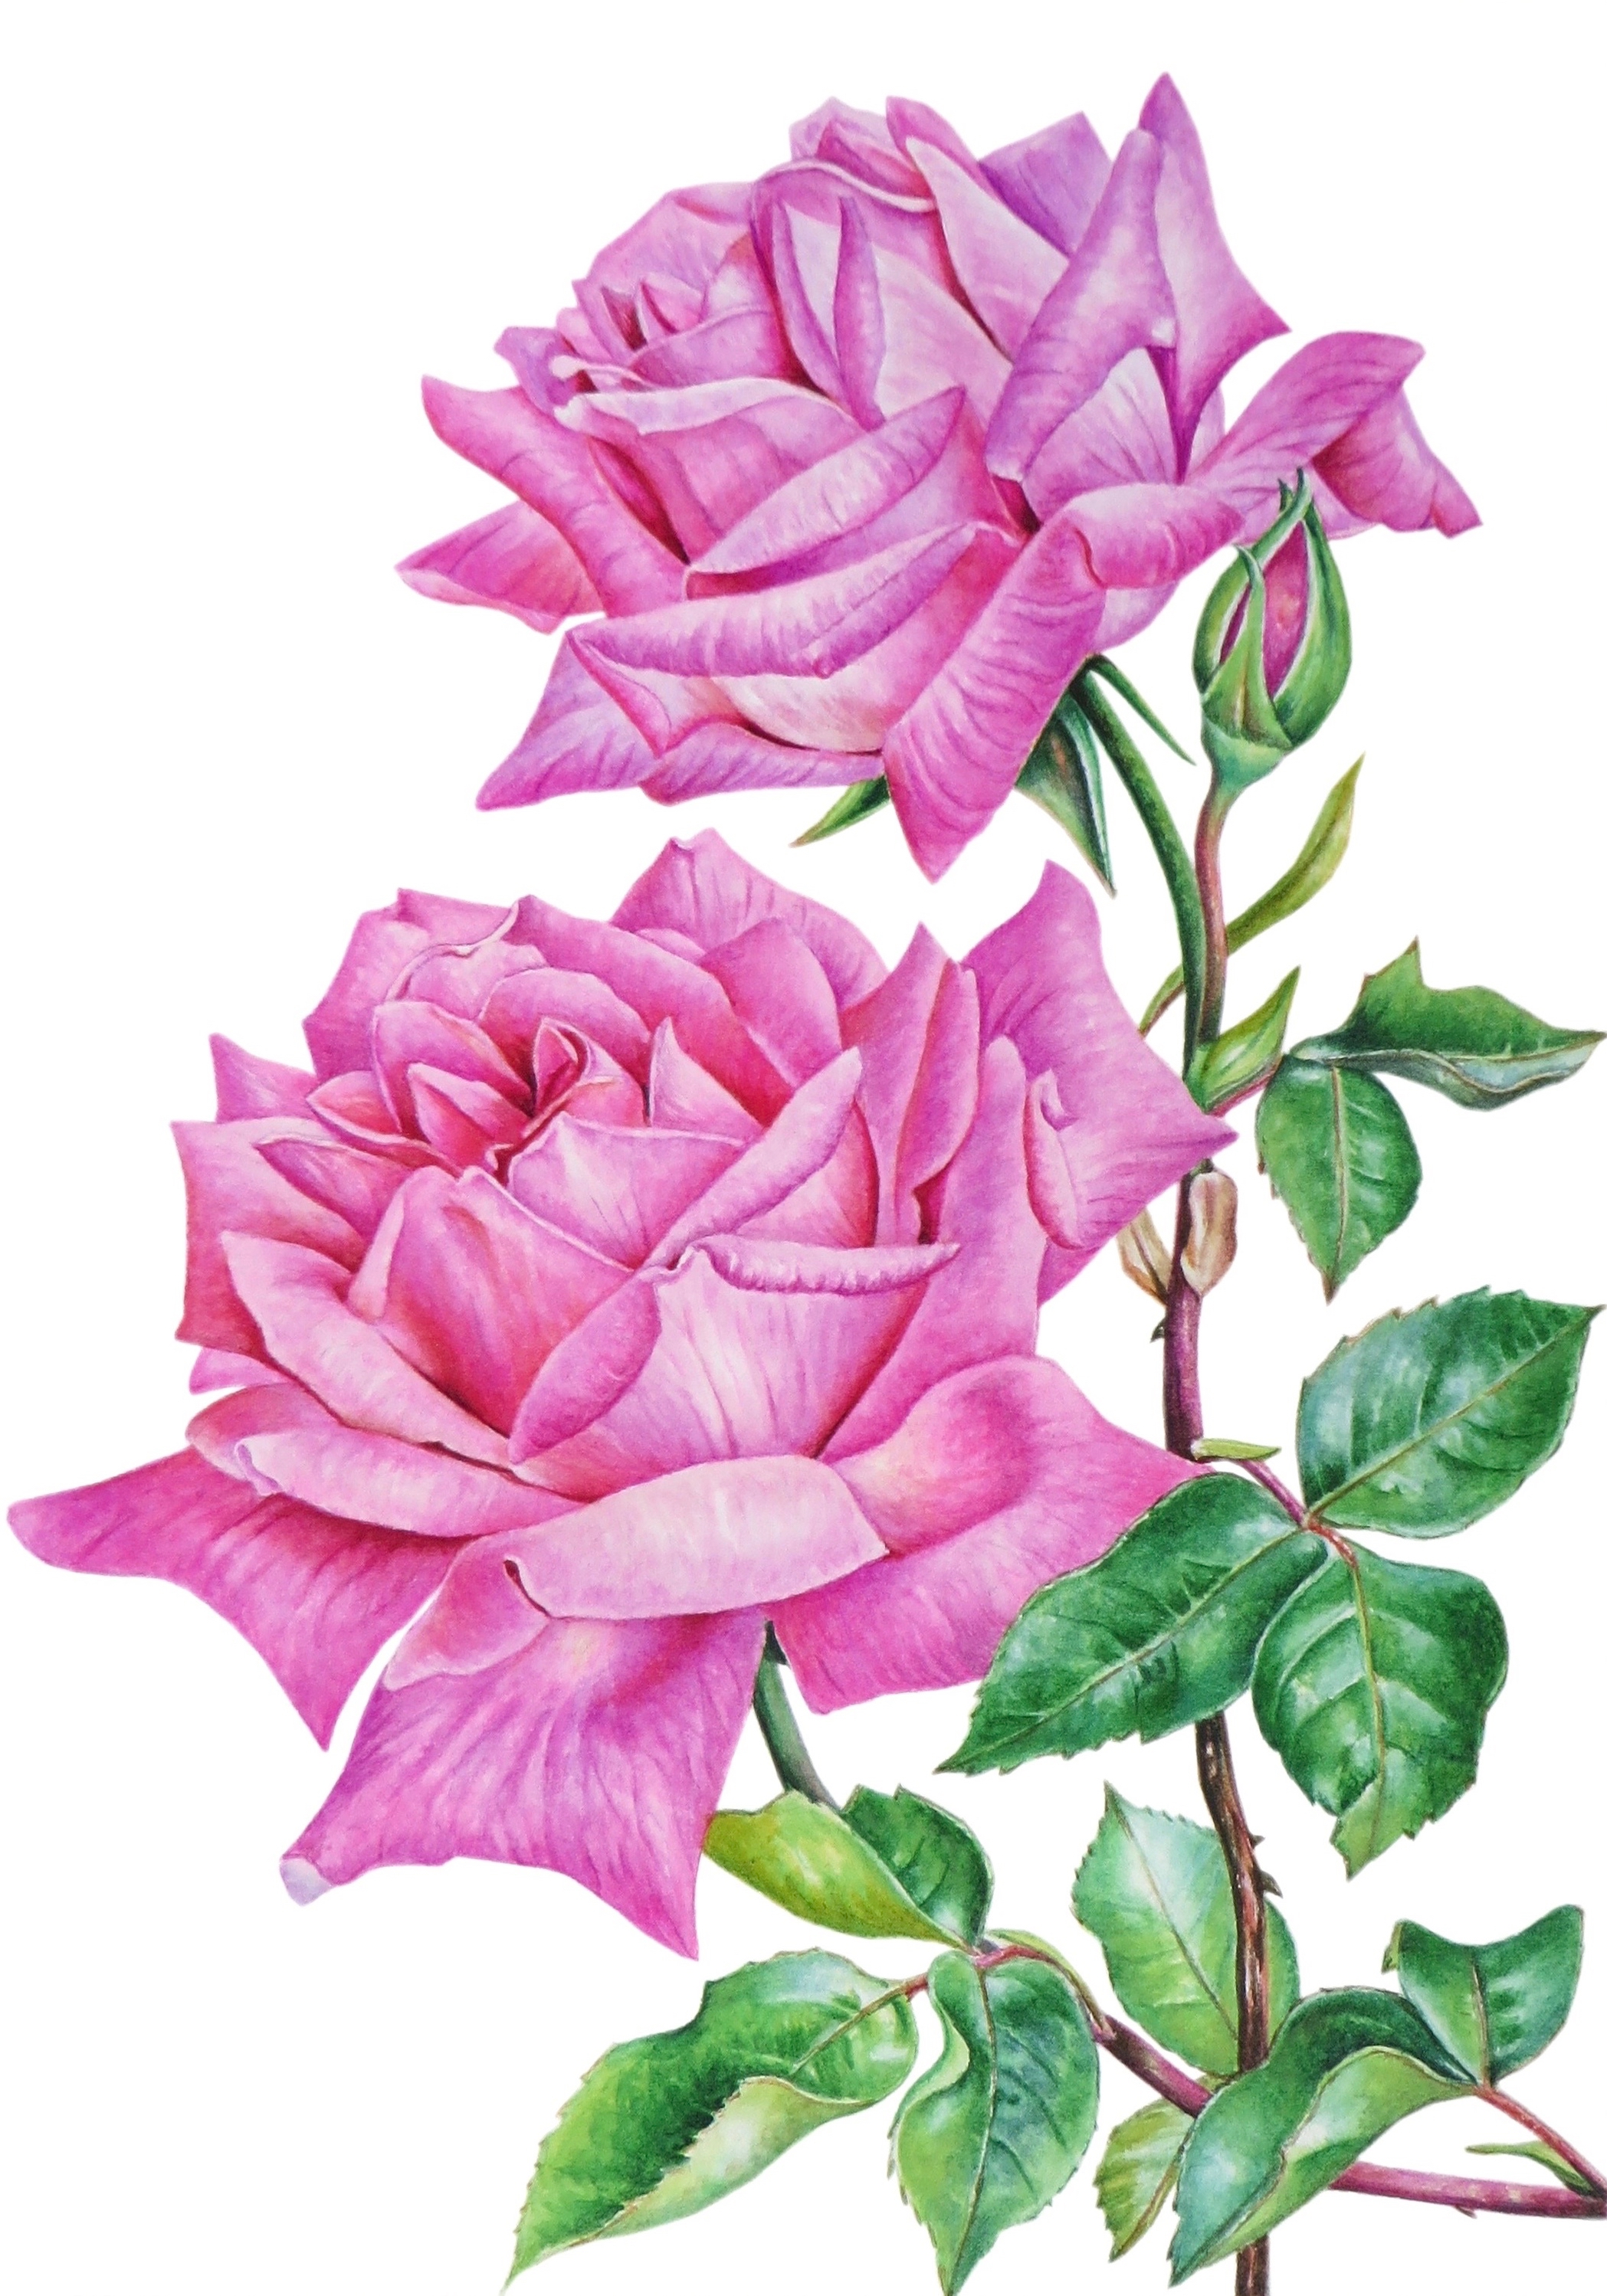 Grandiflora Rose (1)